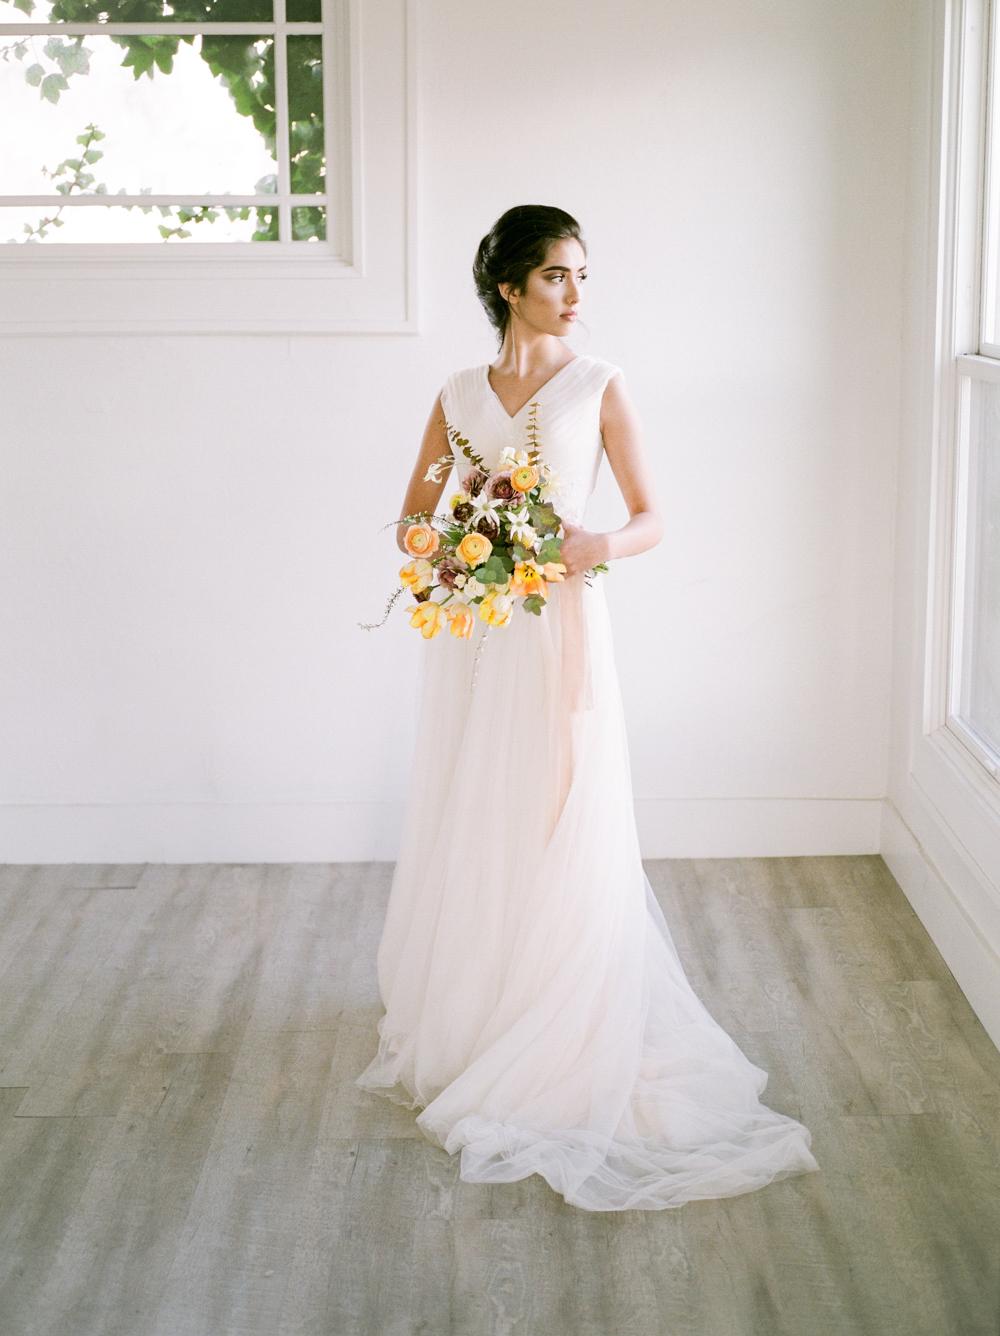 christine-gosch-utah-wedding-photographer-film-photographer-salt-lake-city-spring-utah-wedding-bridal-session-12.jpg